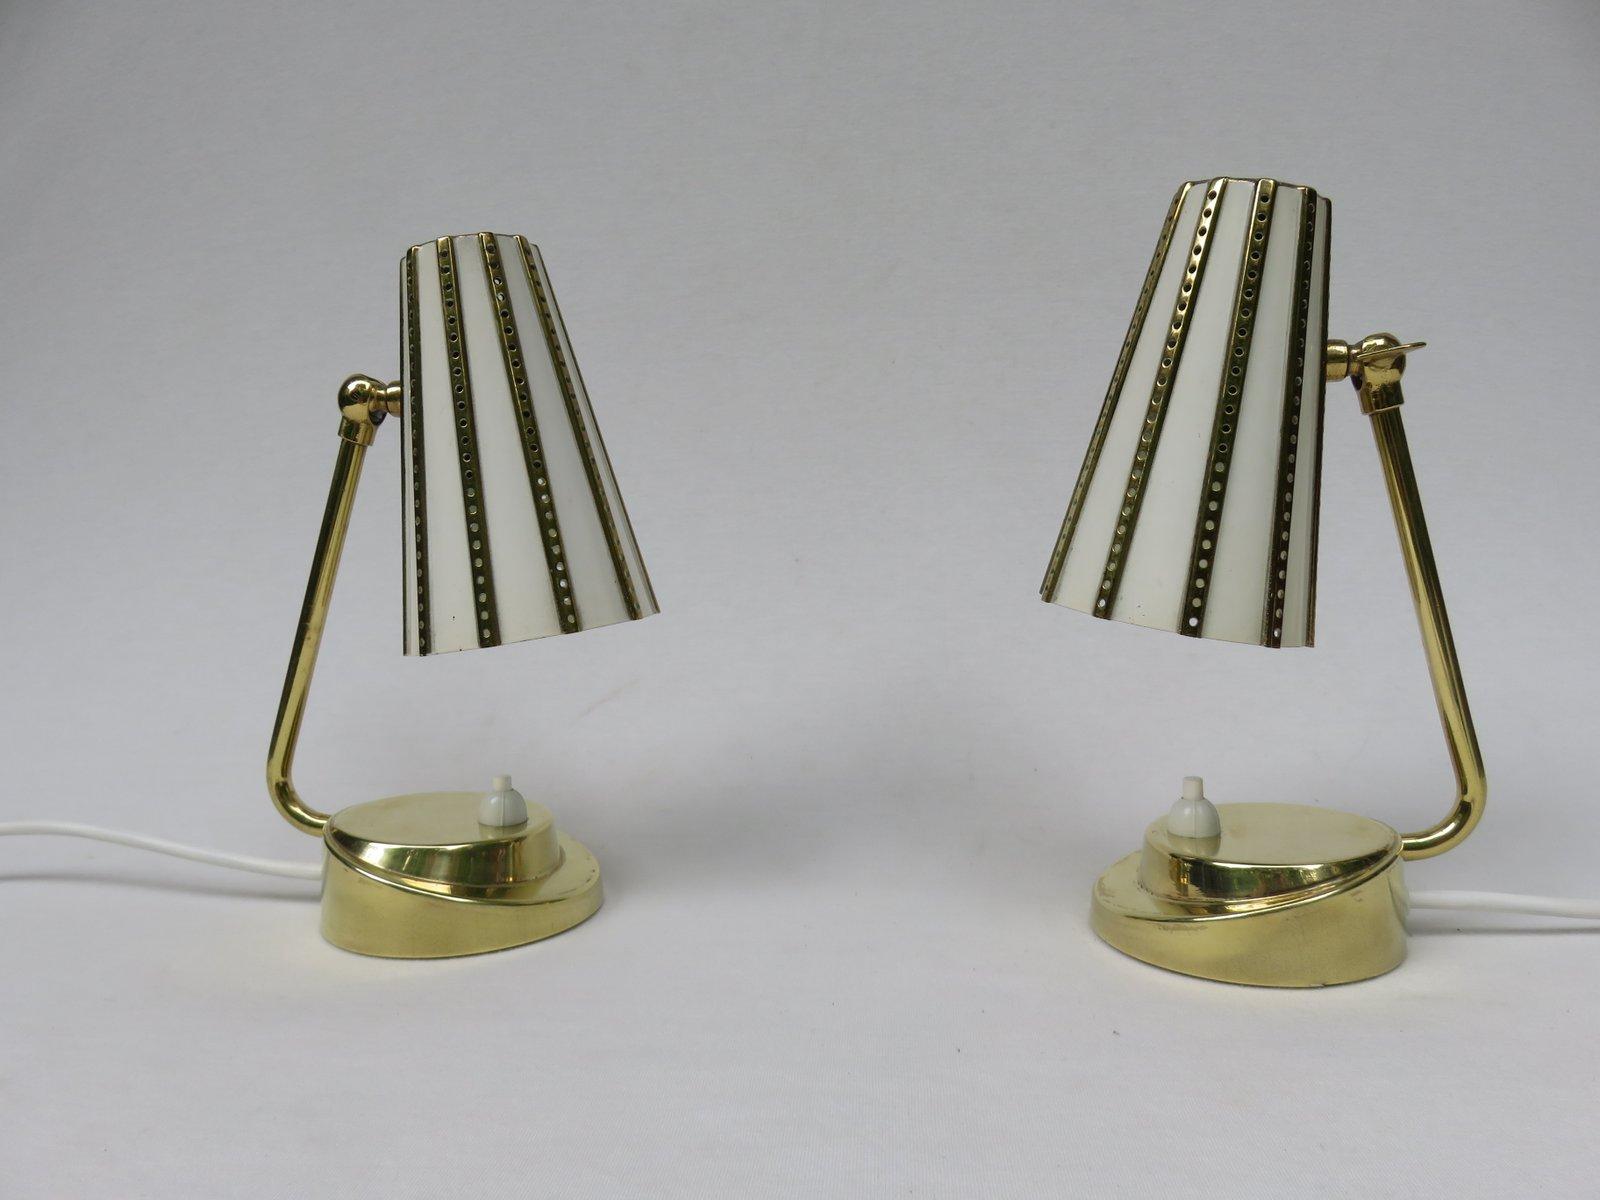 Italienische Messing Nachttischlampen, 1950er, 2er Set